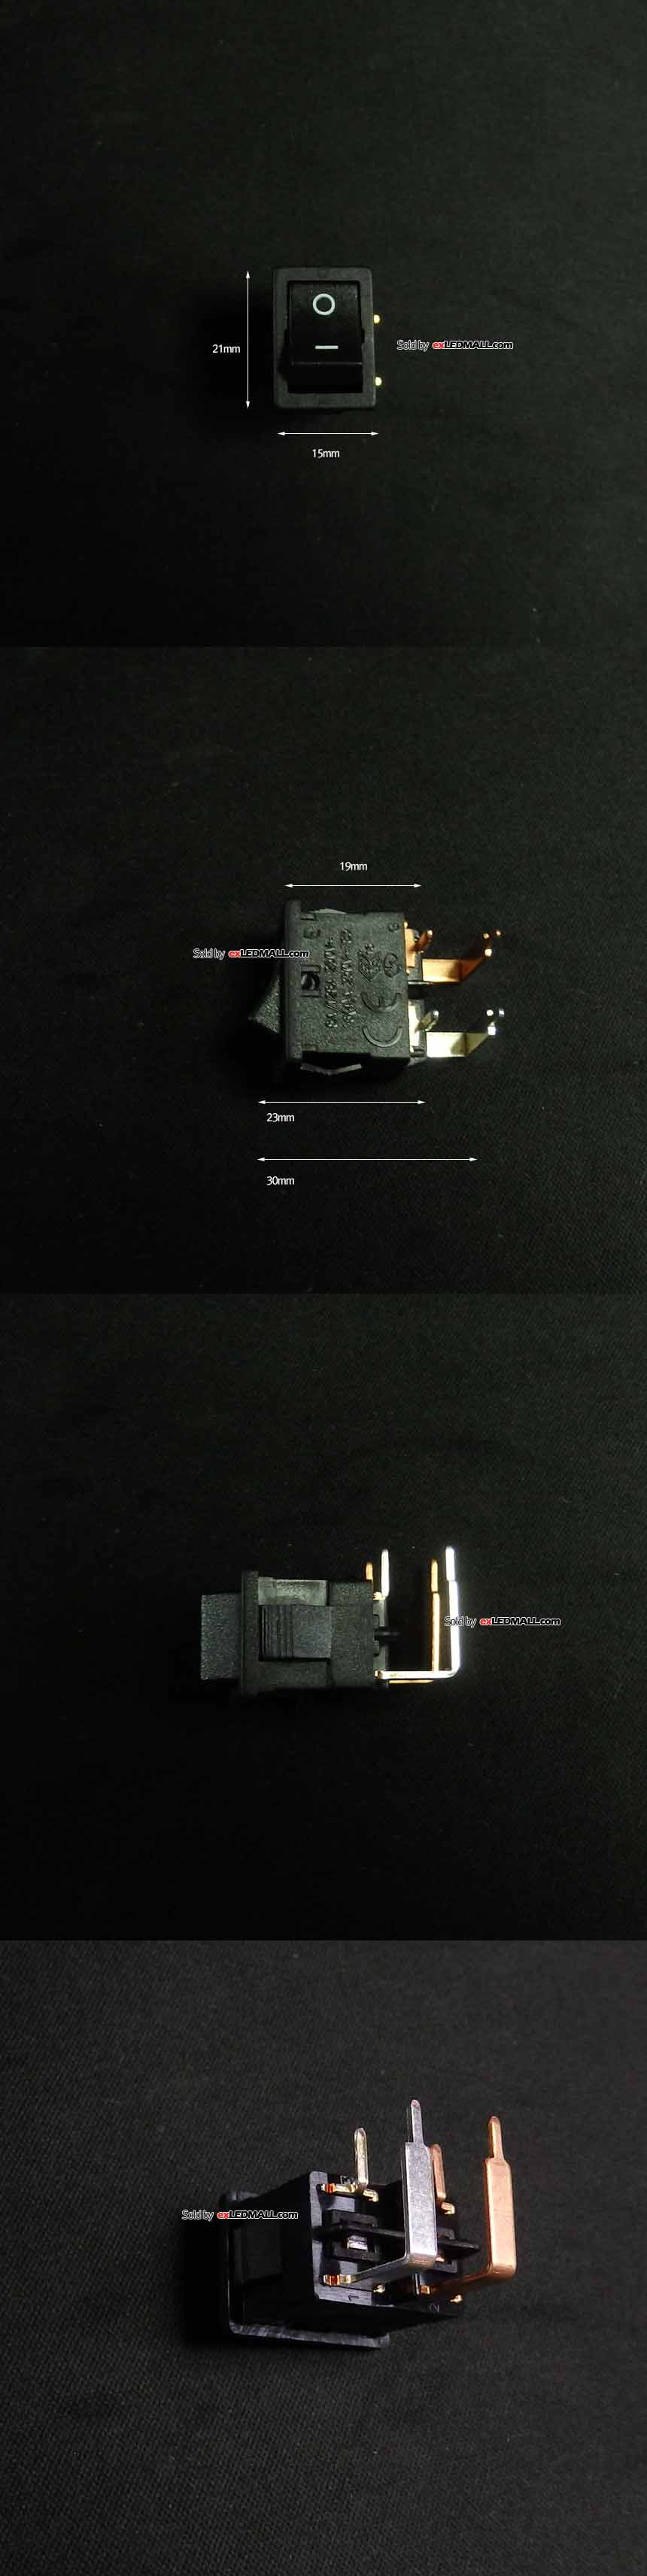 15x21mm 사각 락커 스위치 (PCB용 블랙 2전원용)